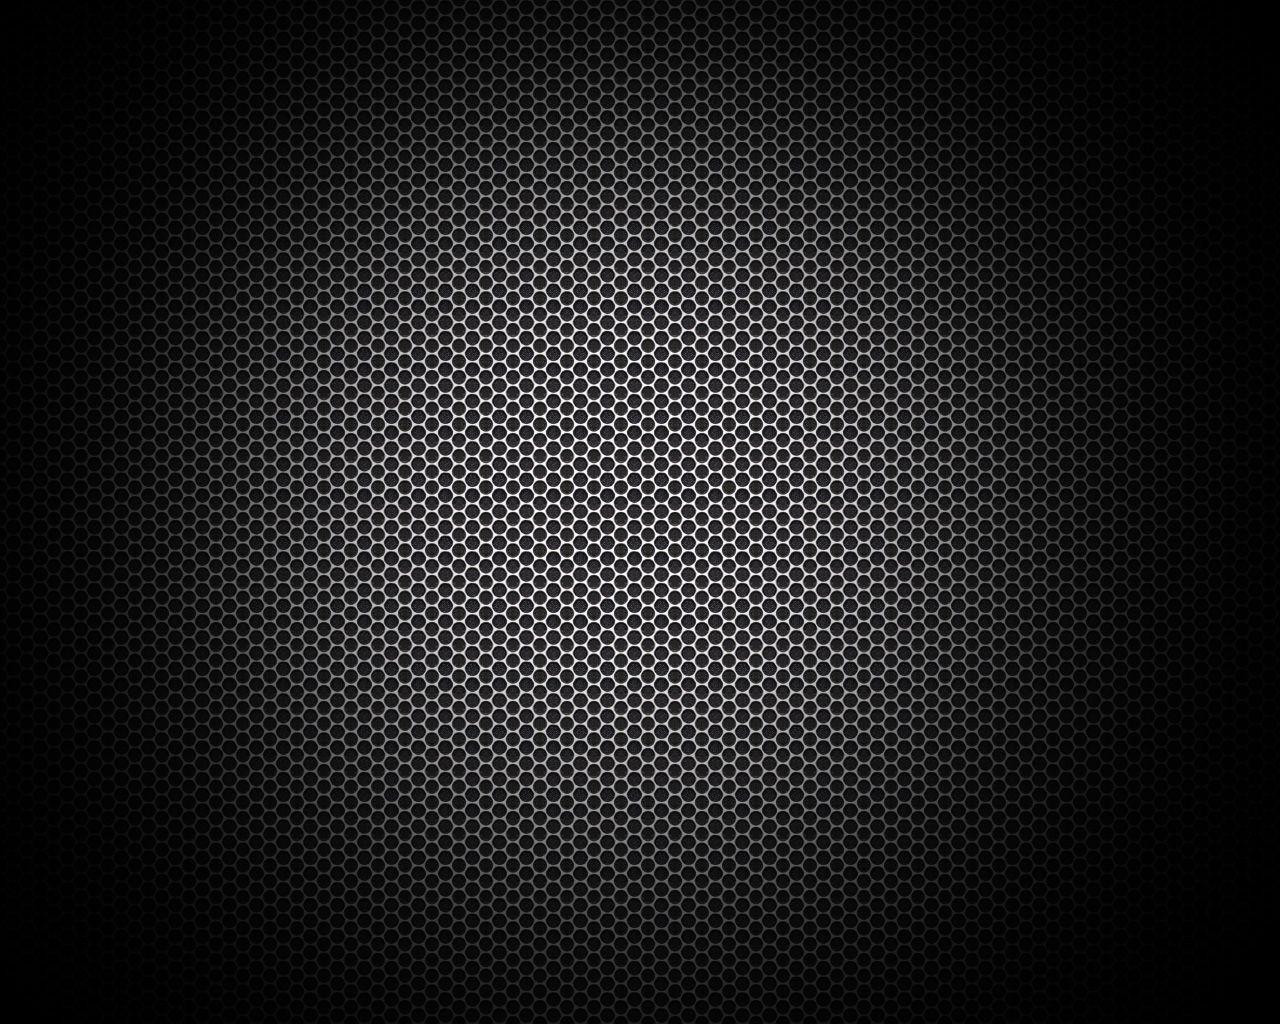 Cool Text Backgrounds - WallpaperSafari